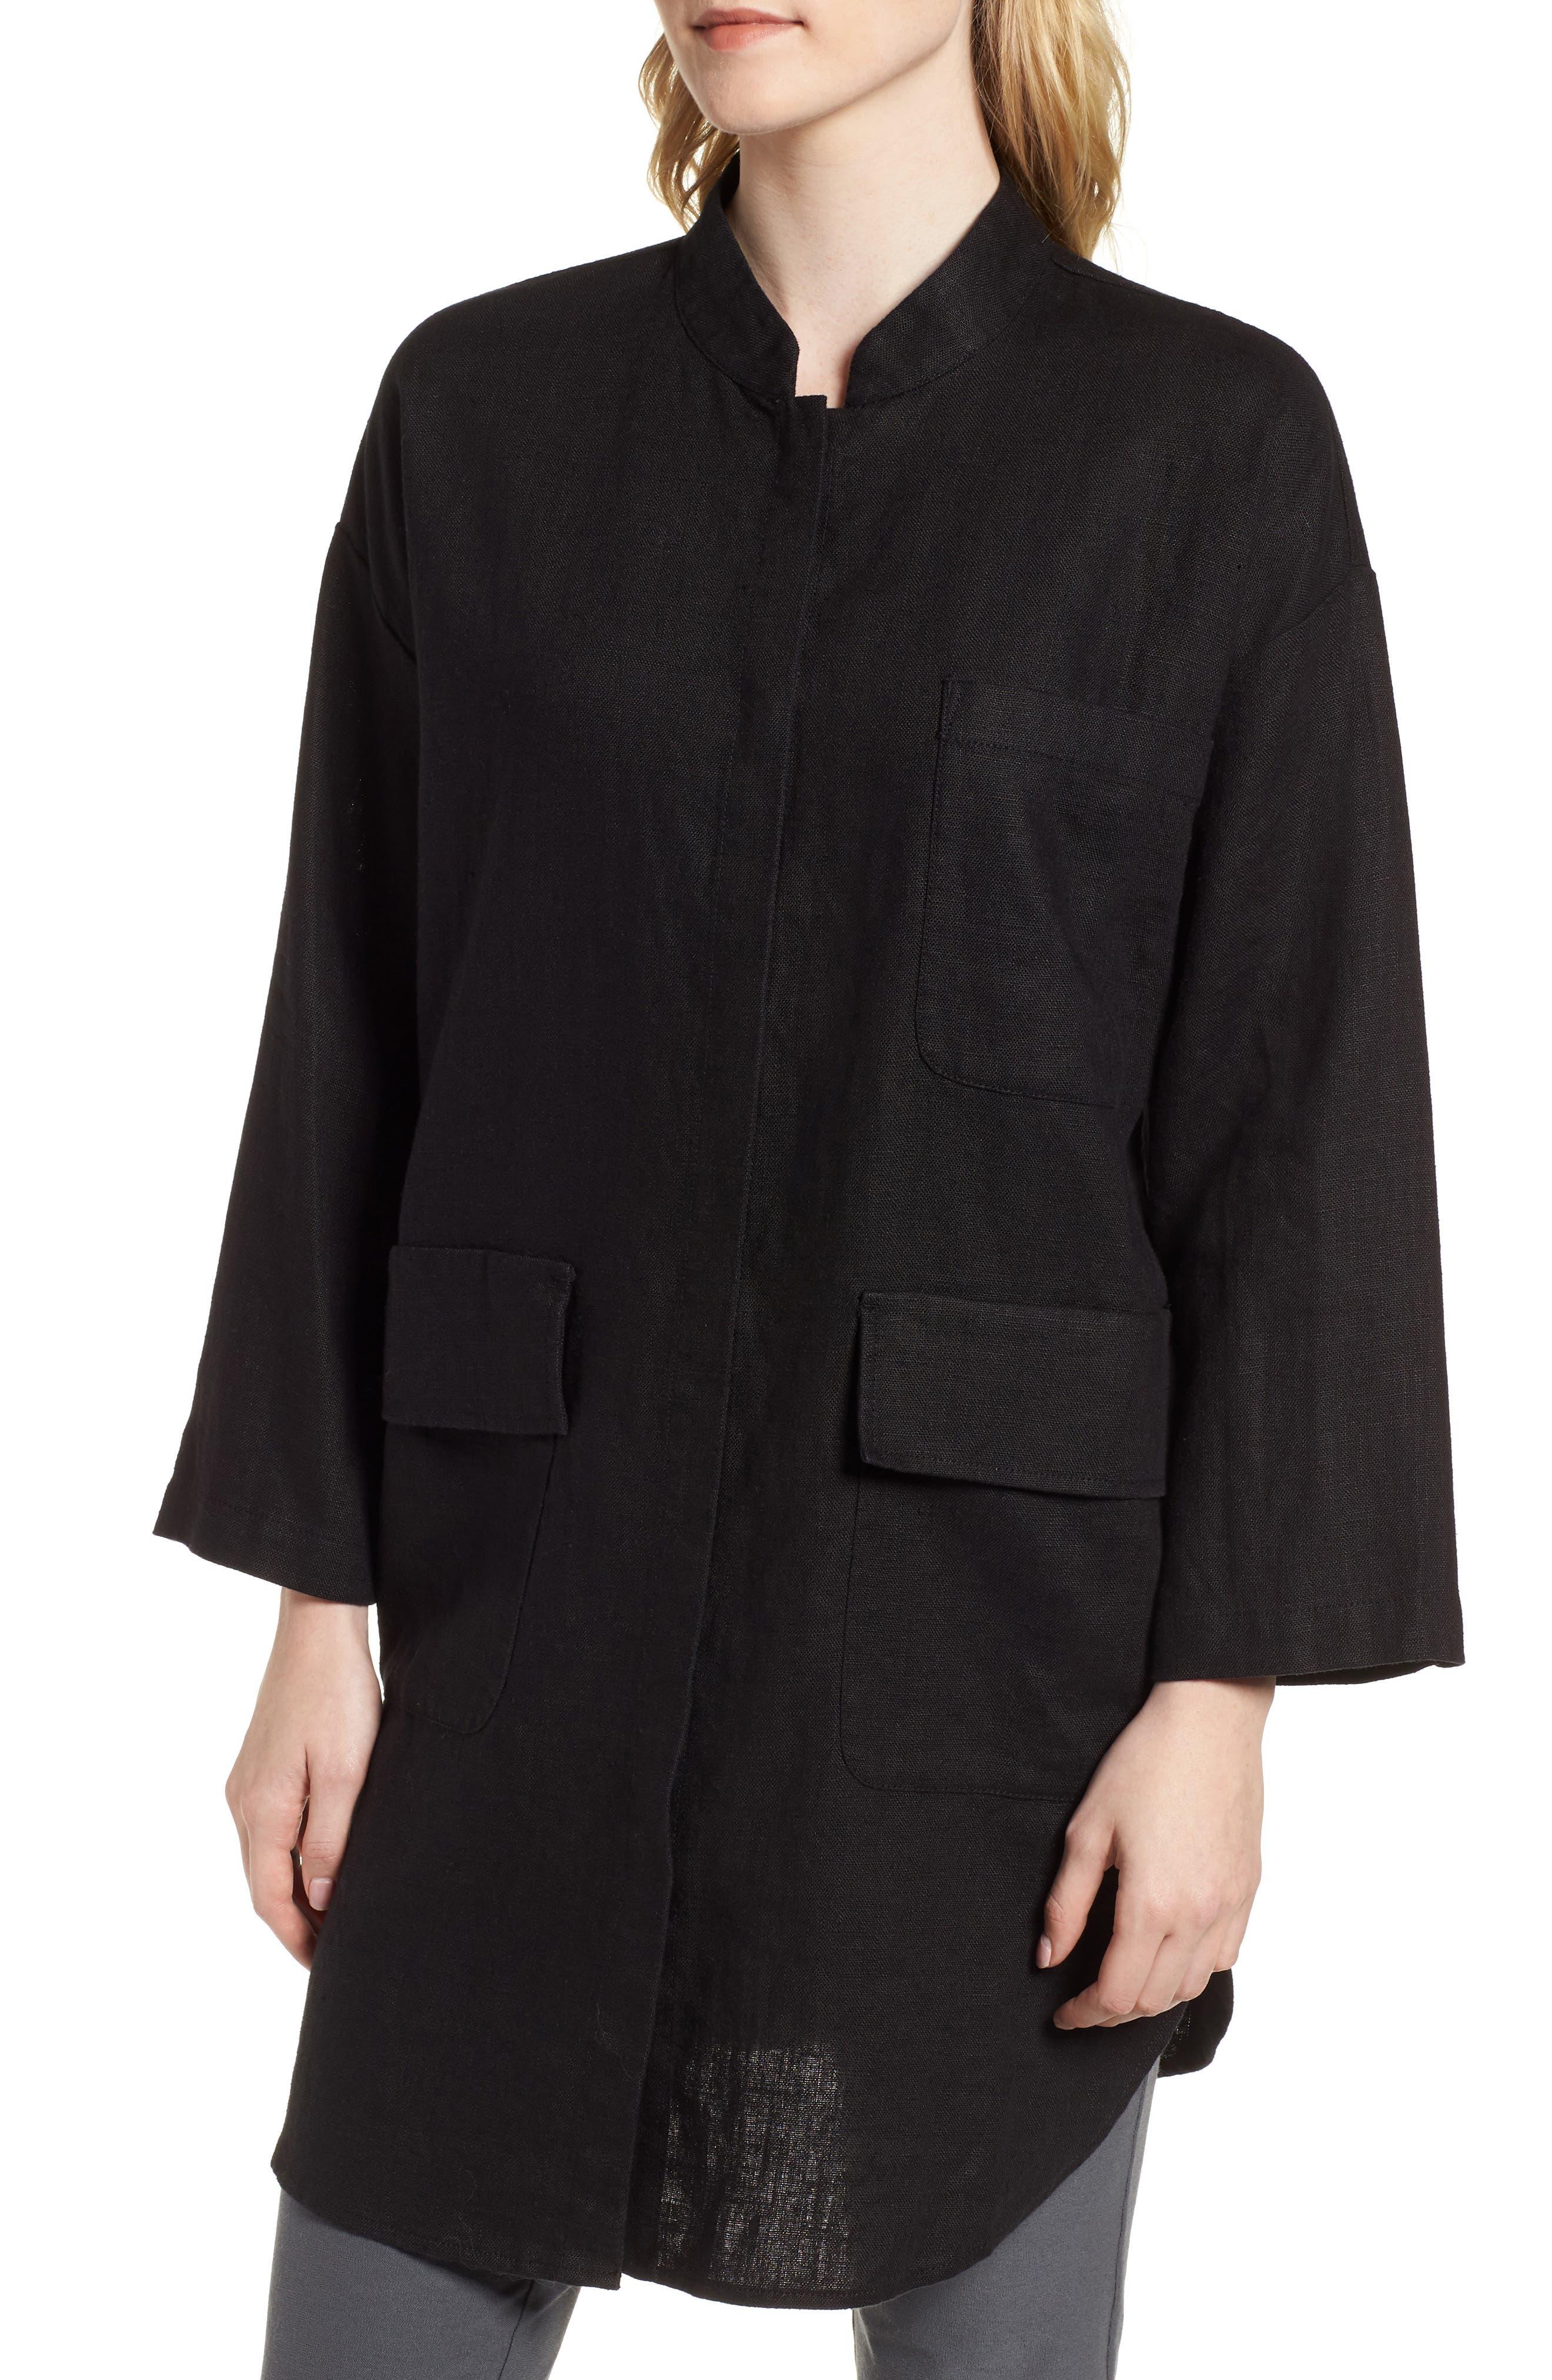 Organic Linen Jacket,                             Alternate thumbnail 4, color,                             001